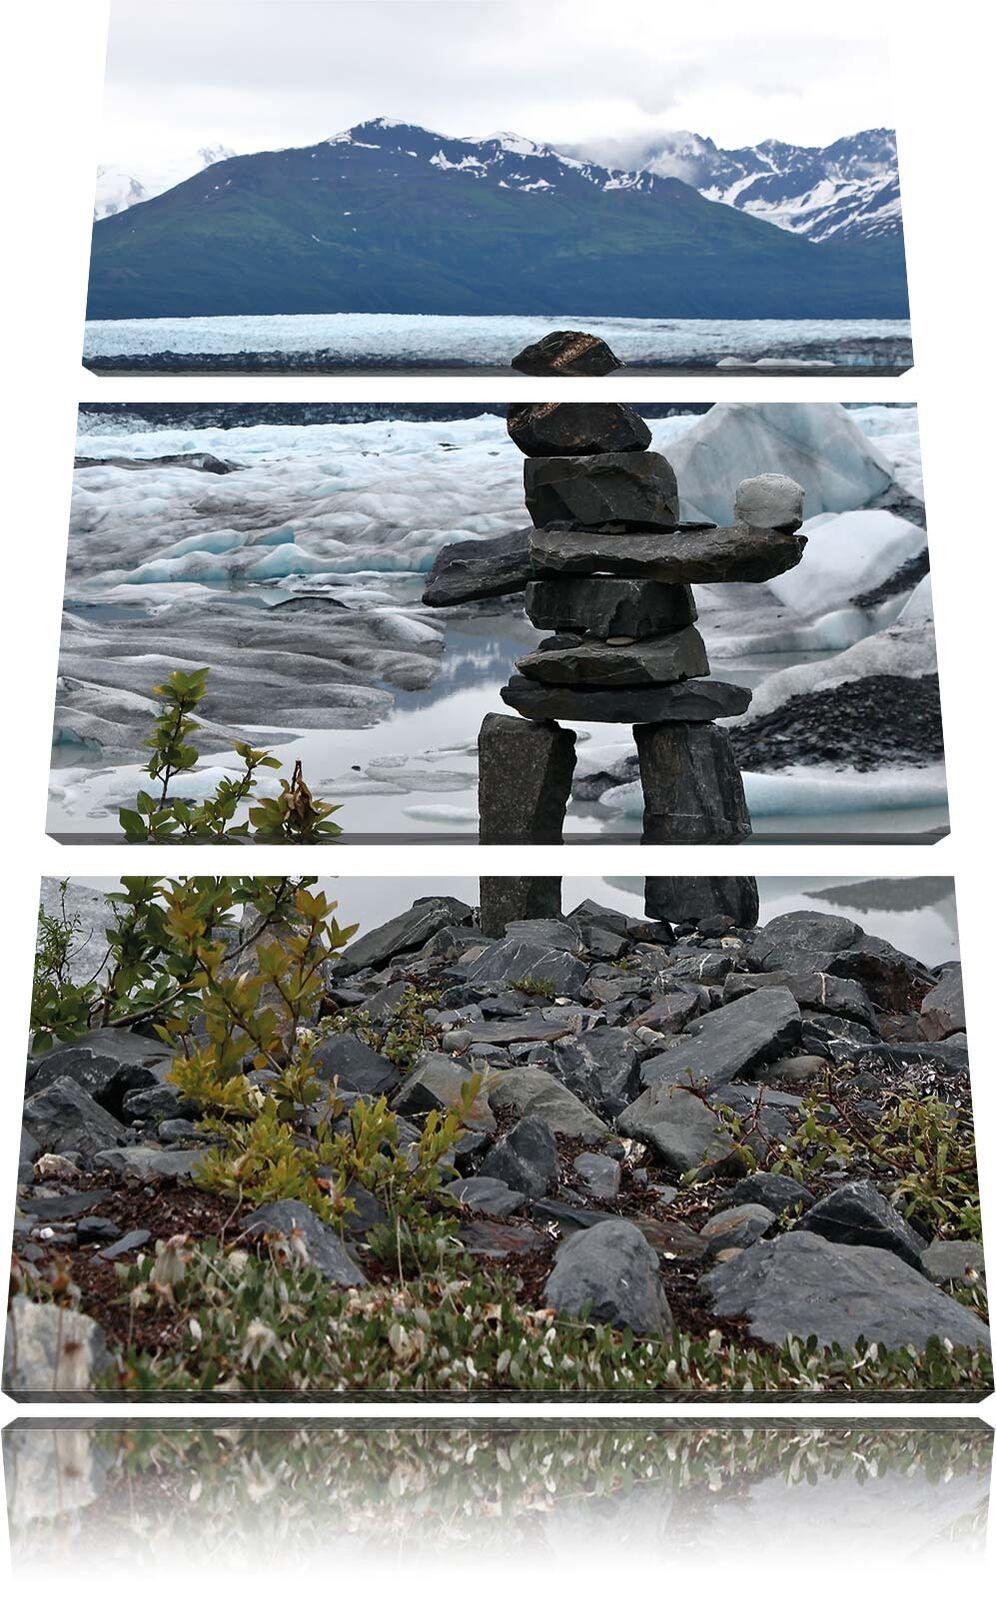 Steinmenschskulptur in Paesaggio 3-Teiler Quadro su Tel Decorazione Parete